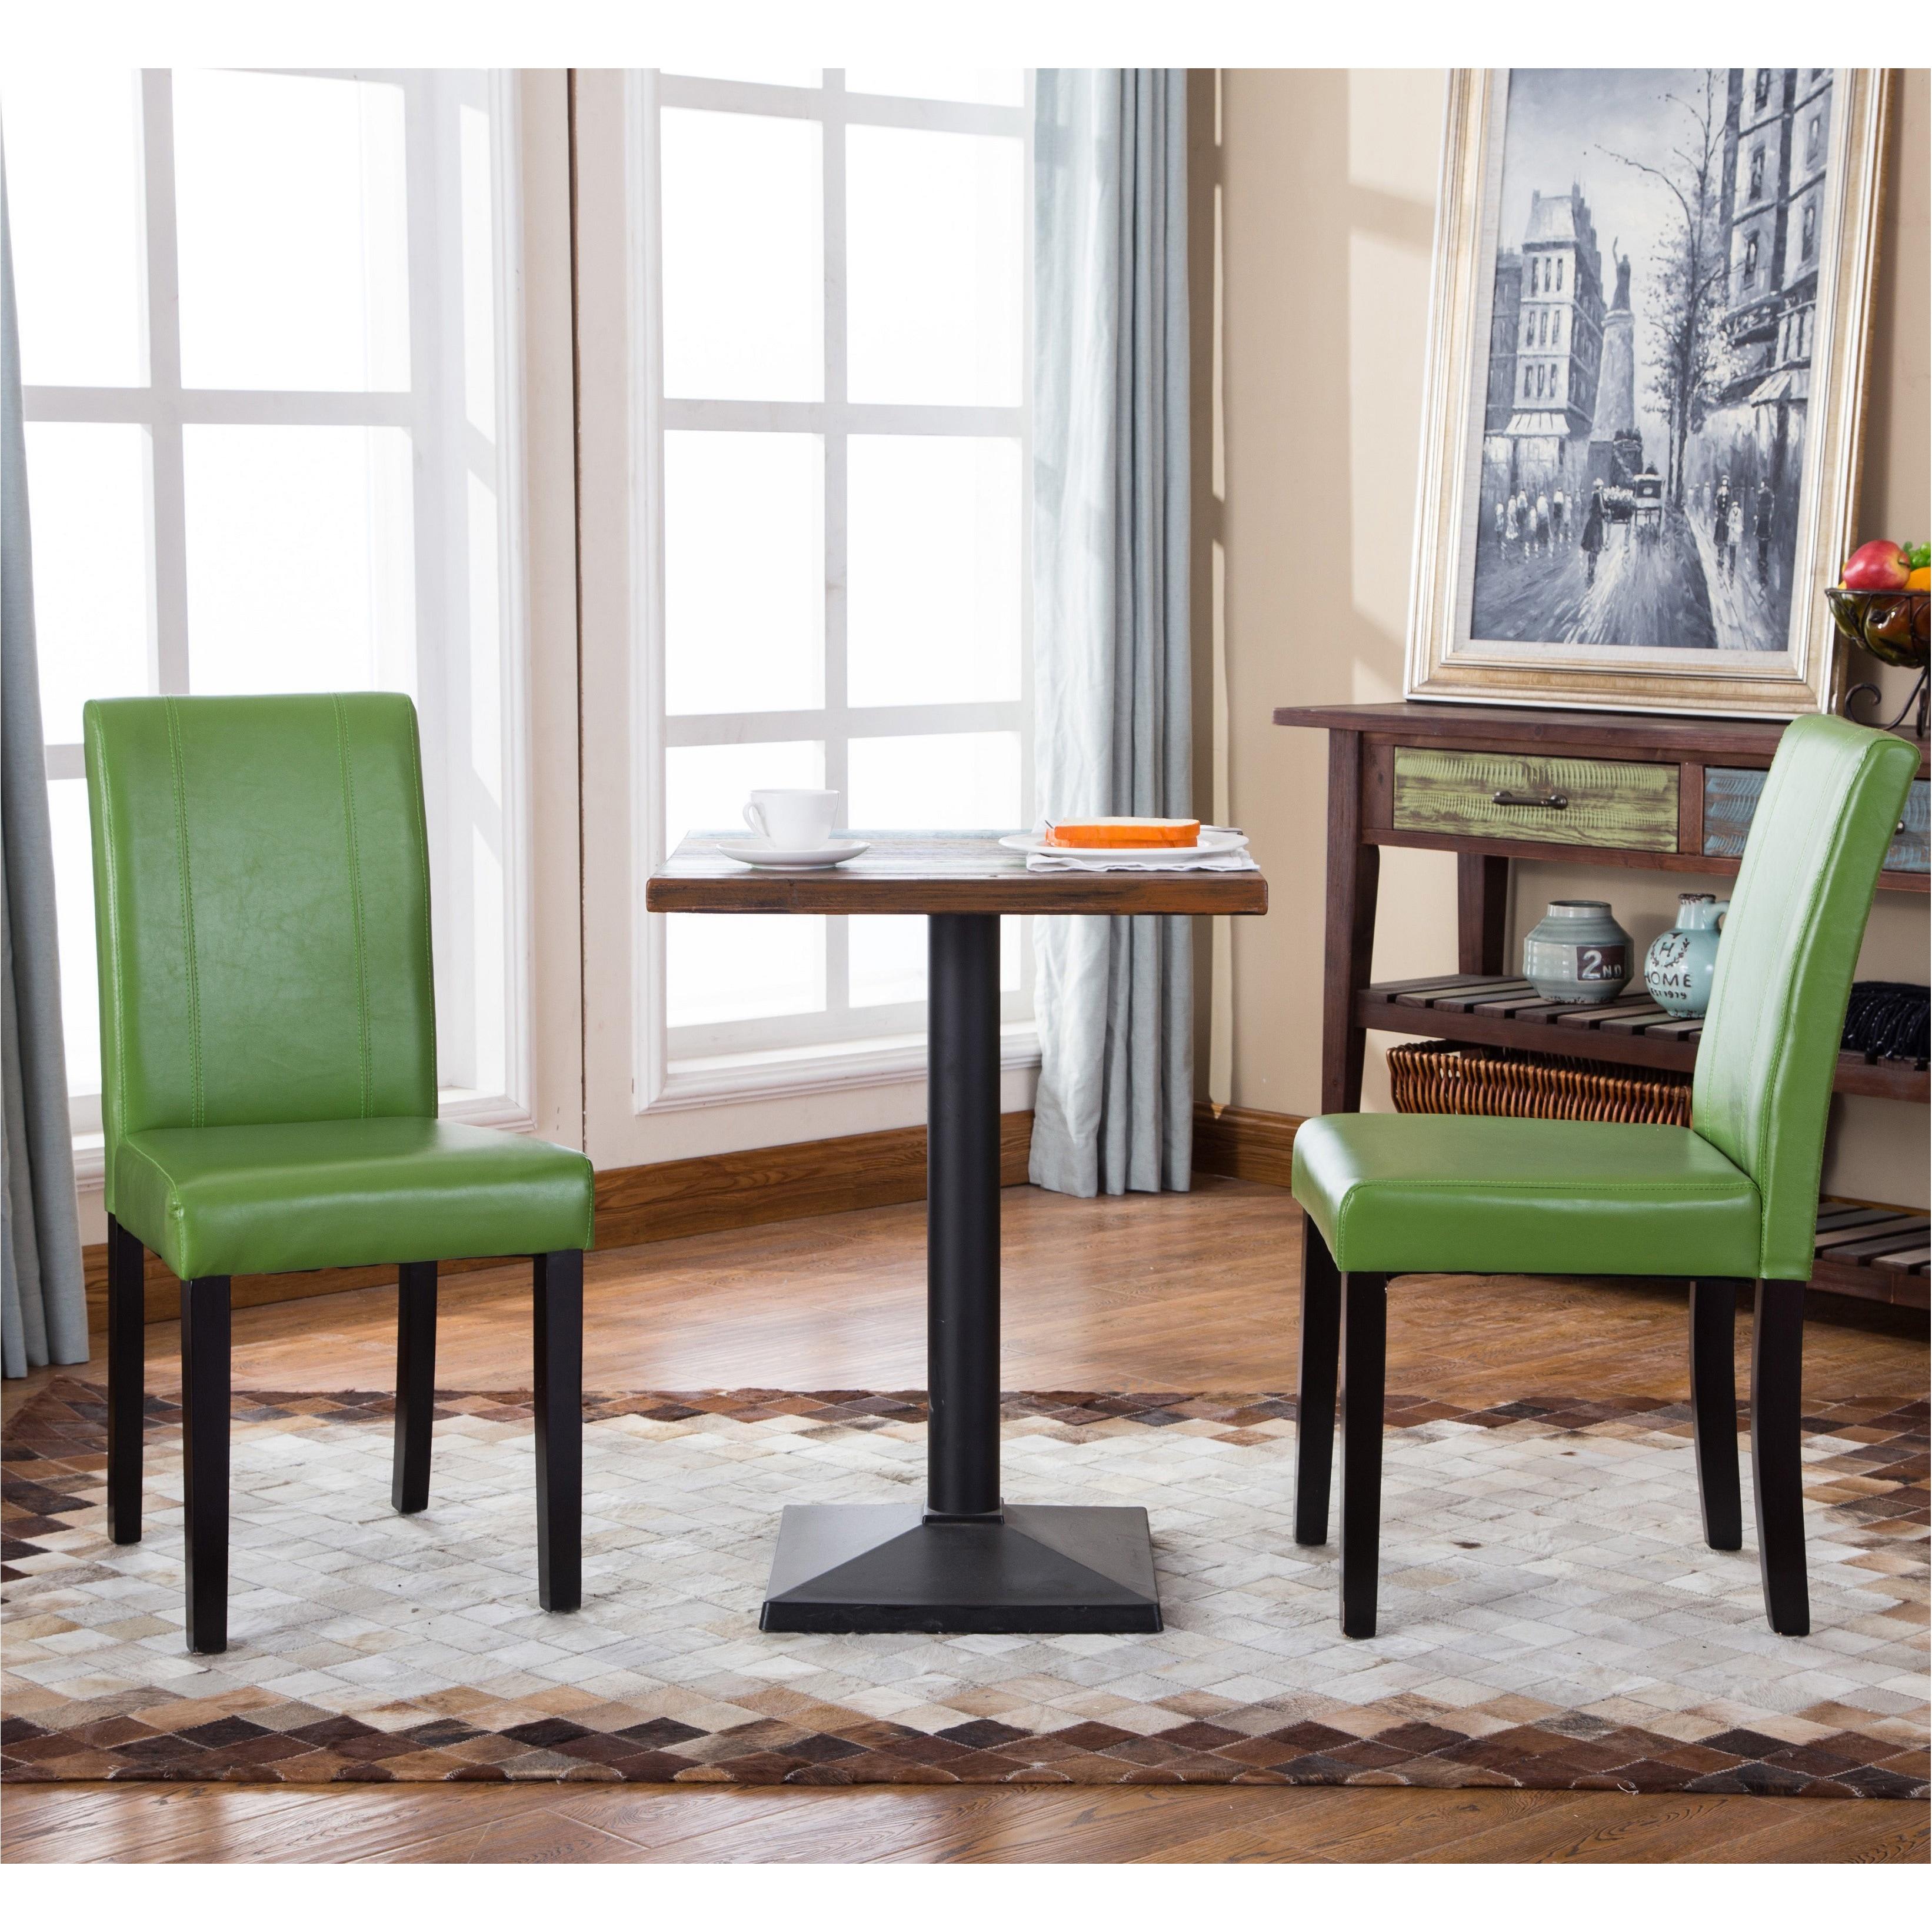 Shop Porch & Den Botanical Heights Hickory Solid Wood Leatherette ...